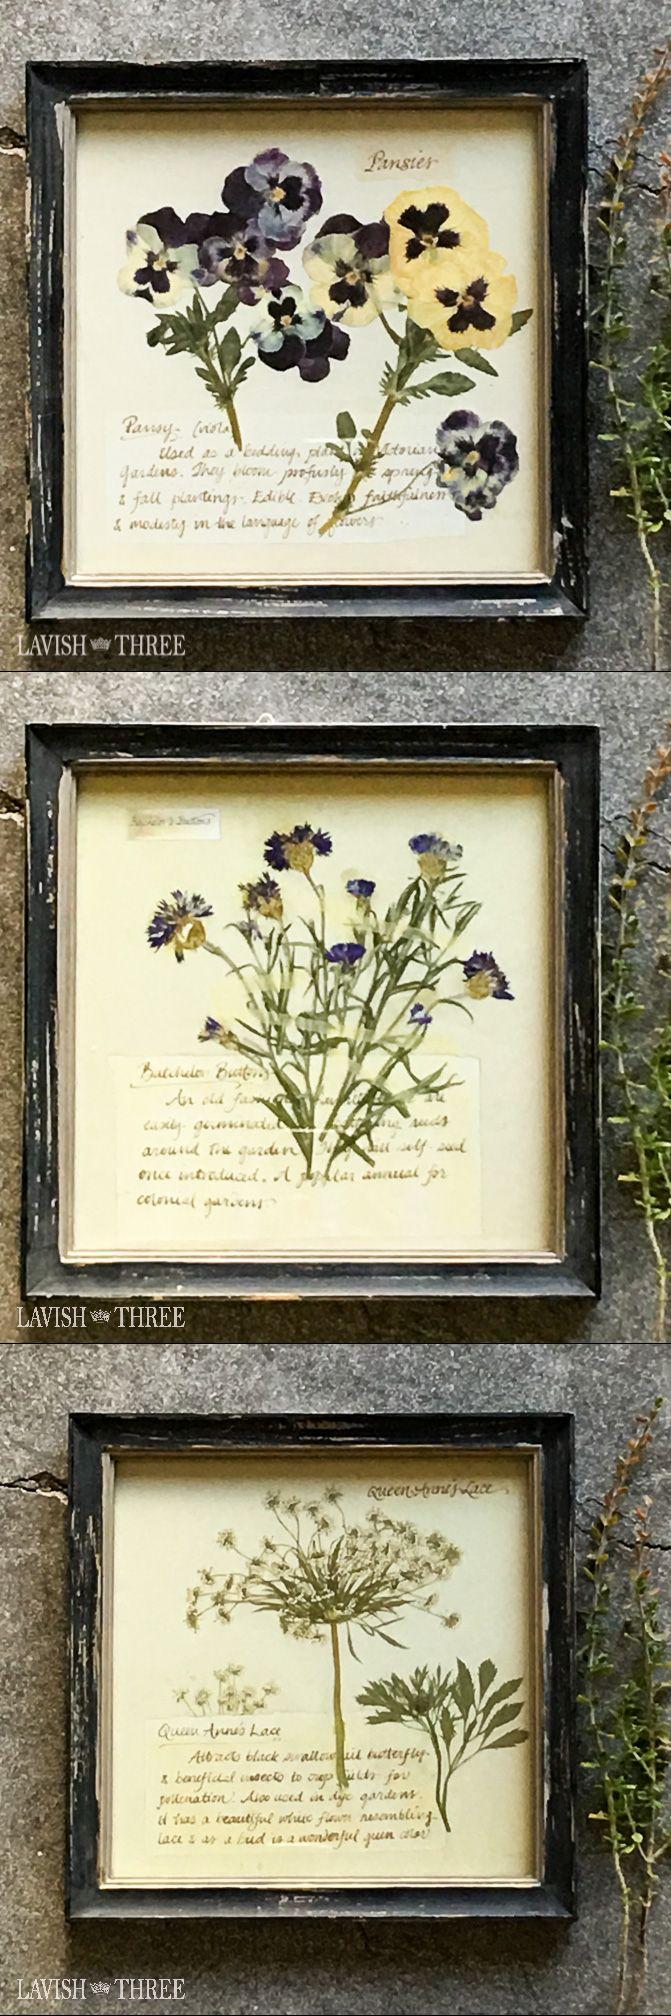 Perfect Pansies Framed Vintage Floral Botanical Print